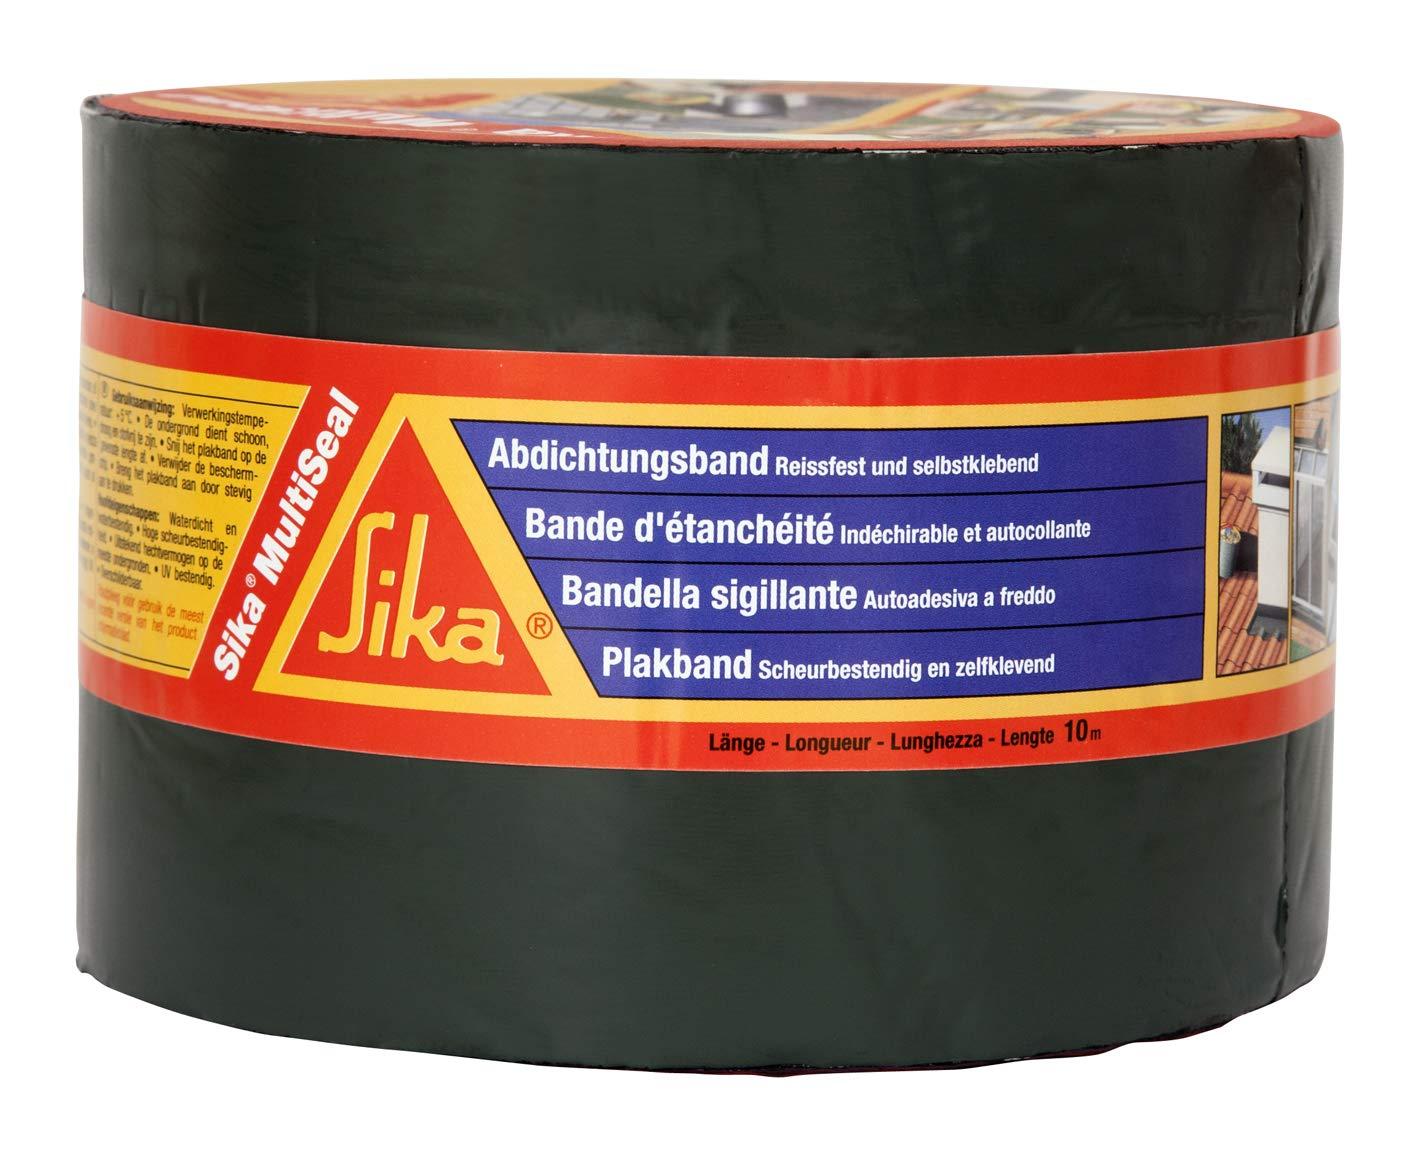 Sika 3734 Multiseal Repair Tape, Self Adhesive, 200 mm x 10 m Grey 200mm x 10m Grey SIKA FRANCE S.A.S